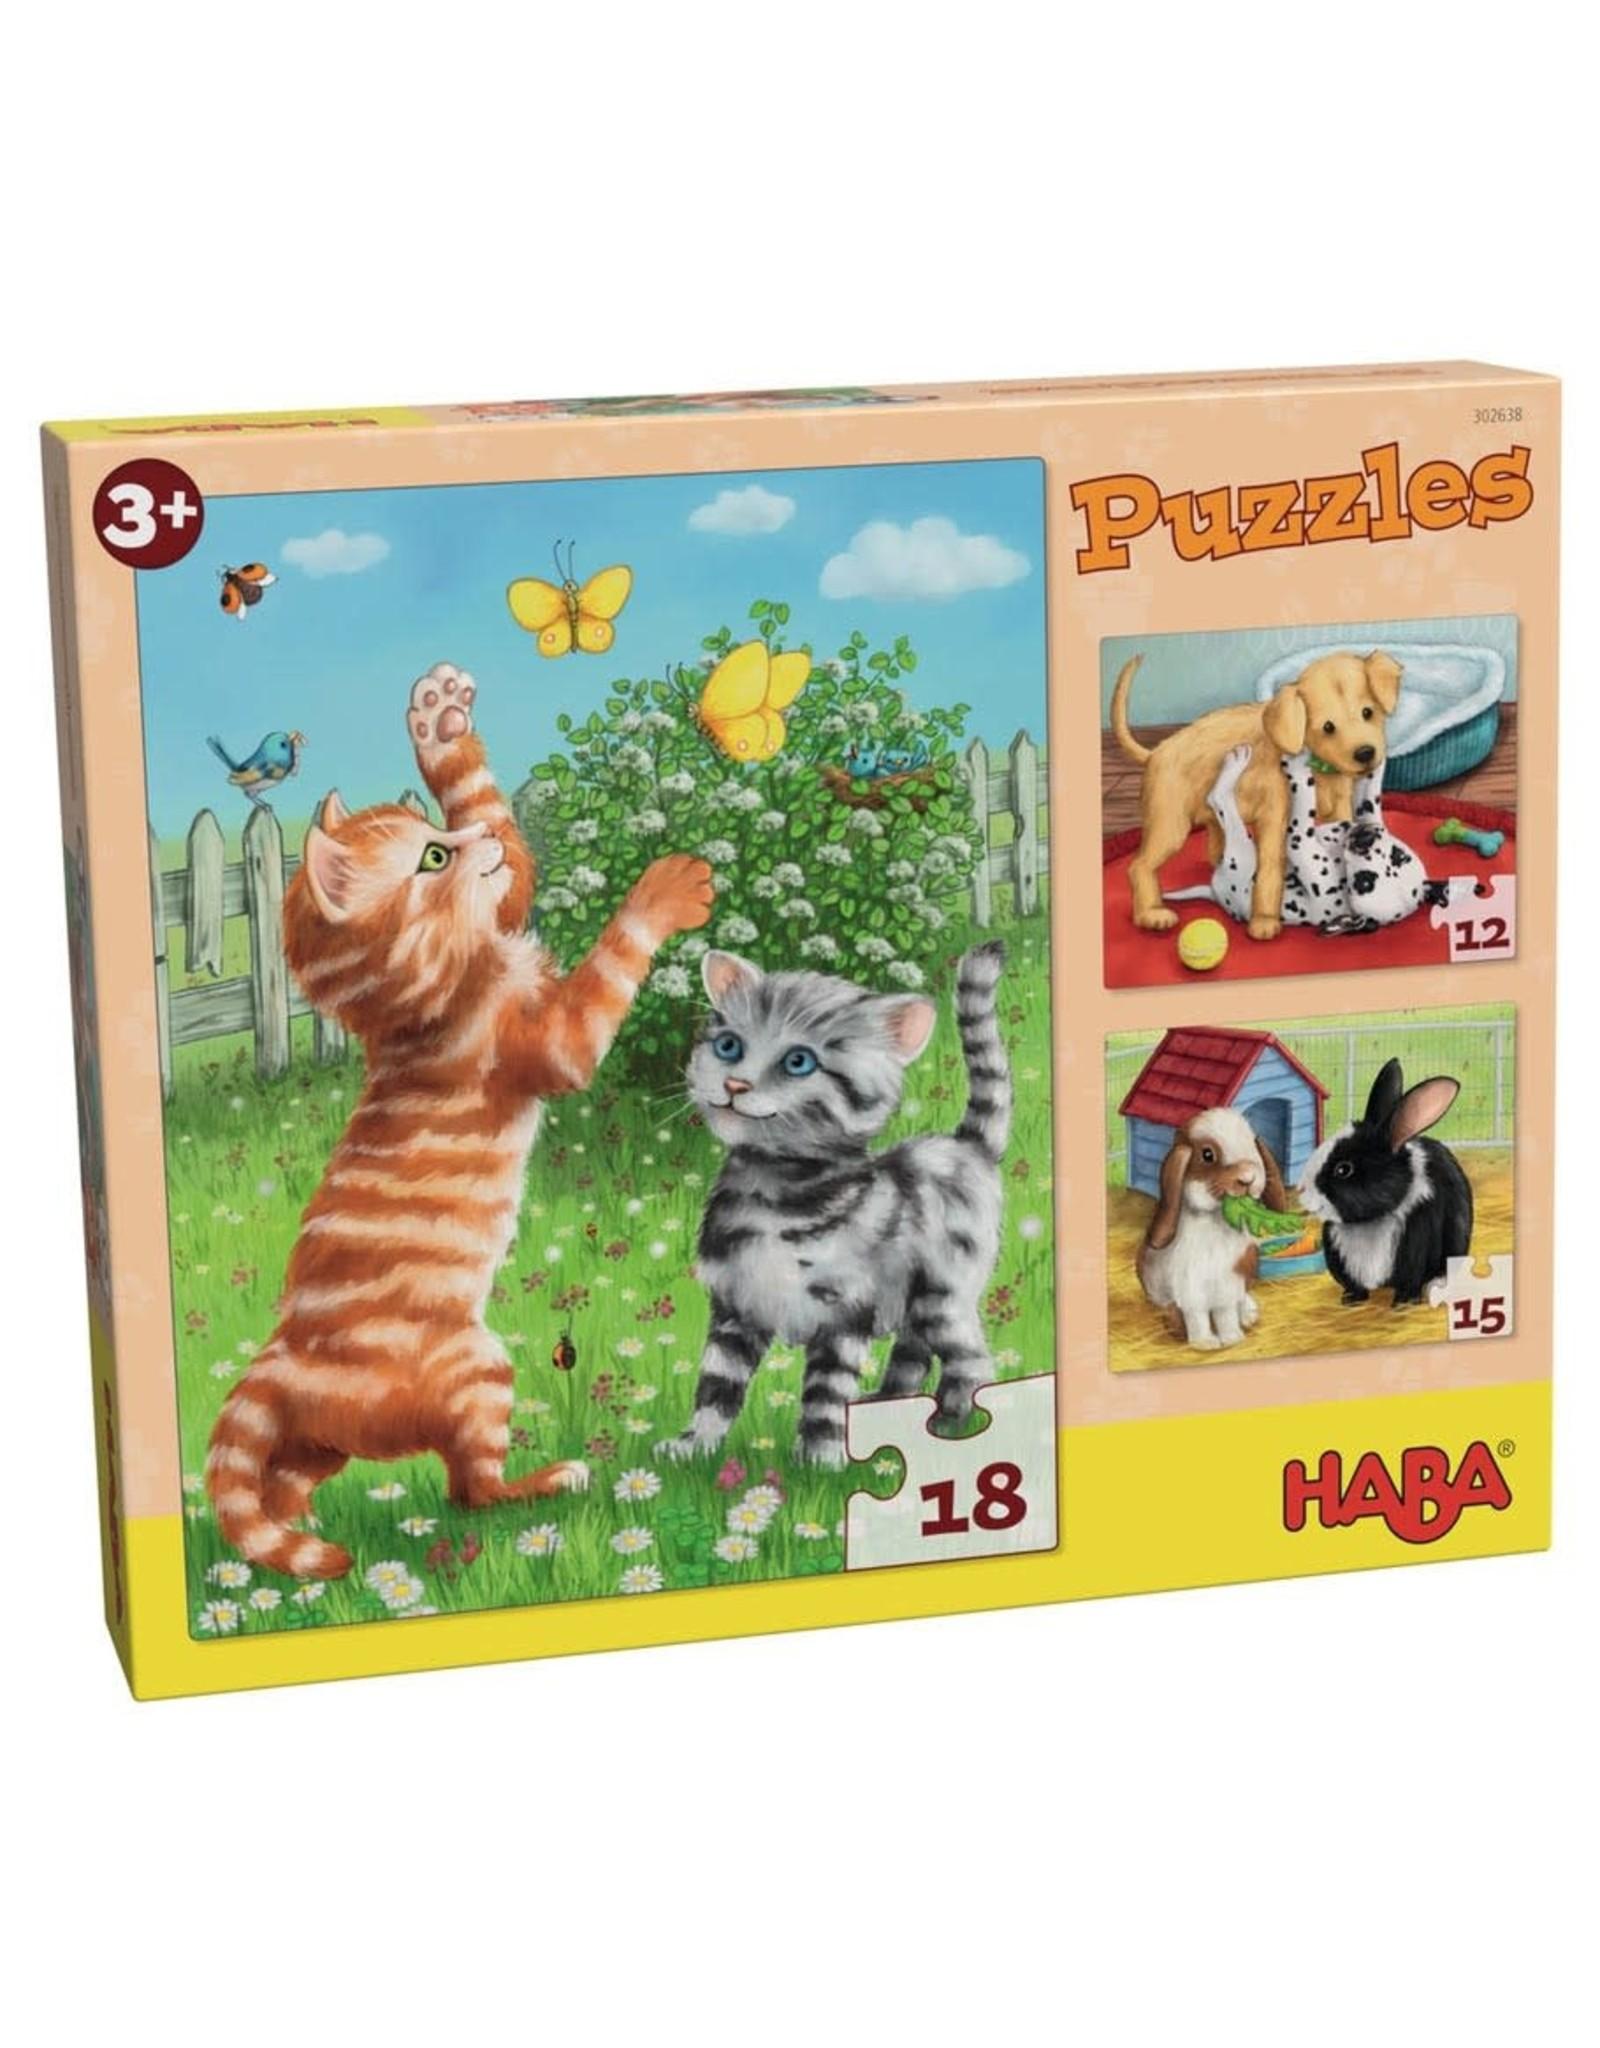 Puzzle: Pets Multipack